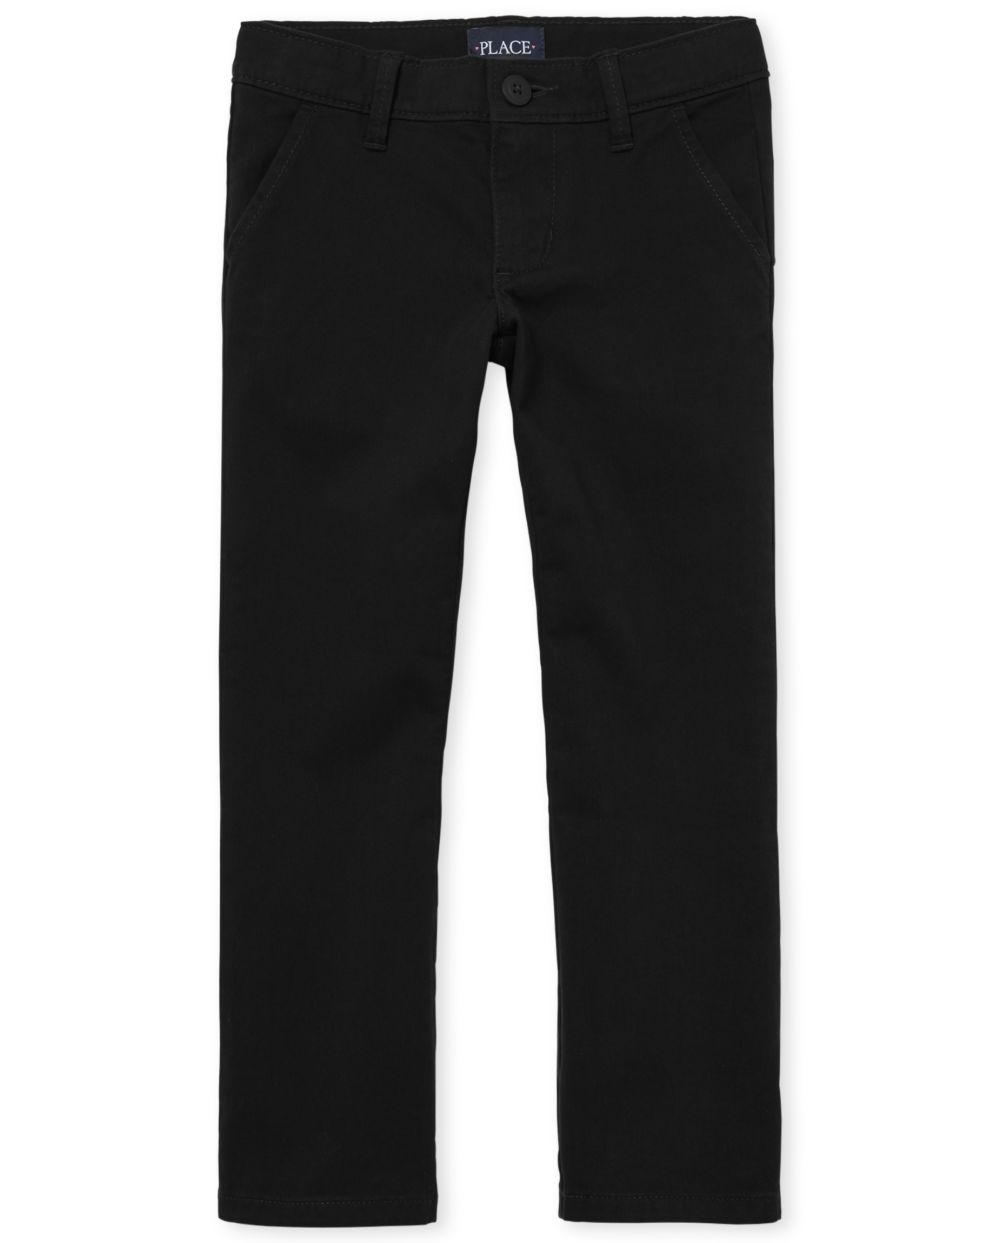 Promos Girls Uniform Bootcut Chino Pants